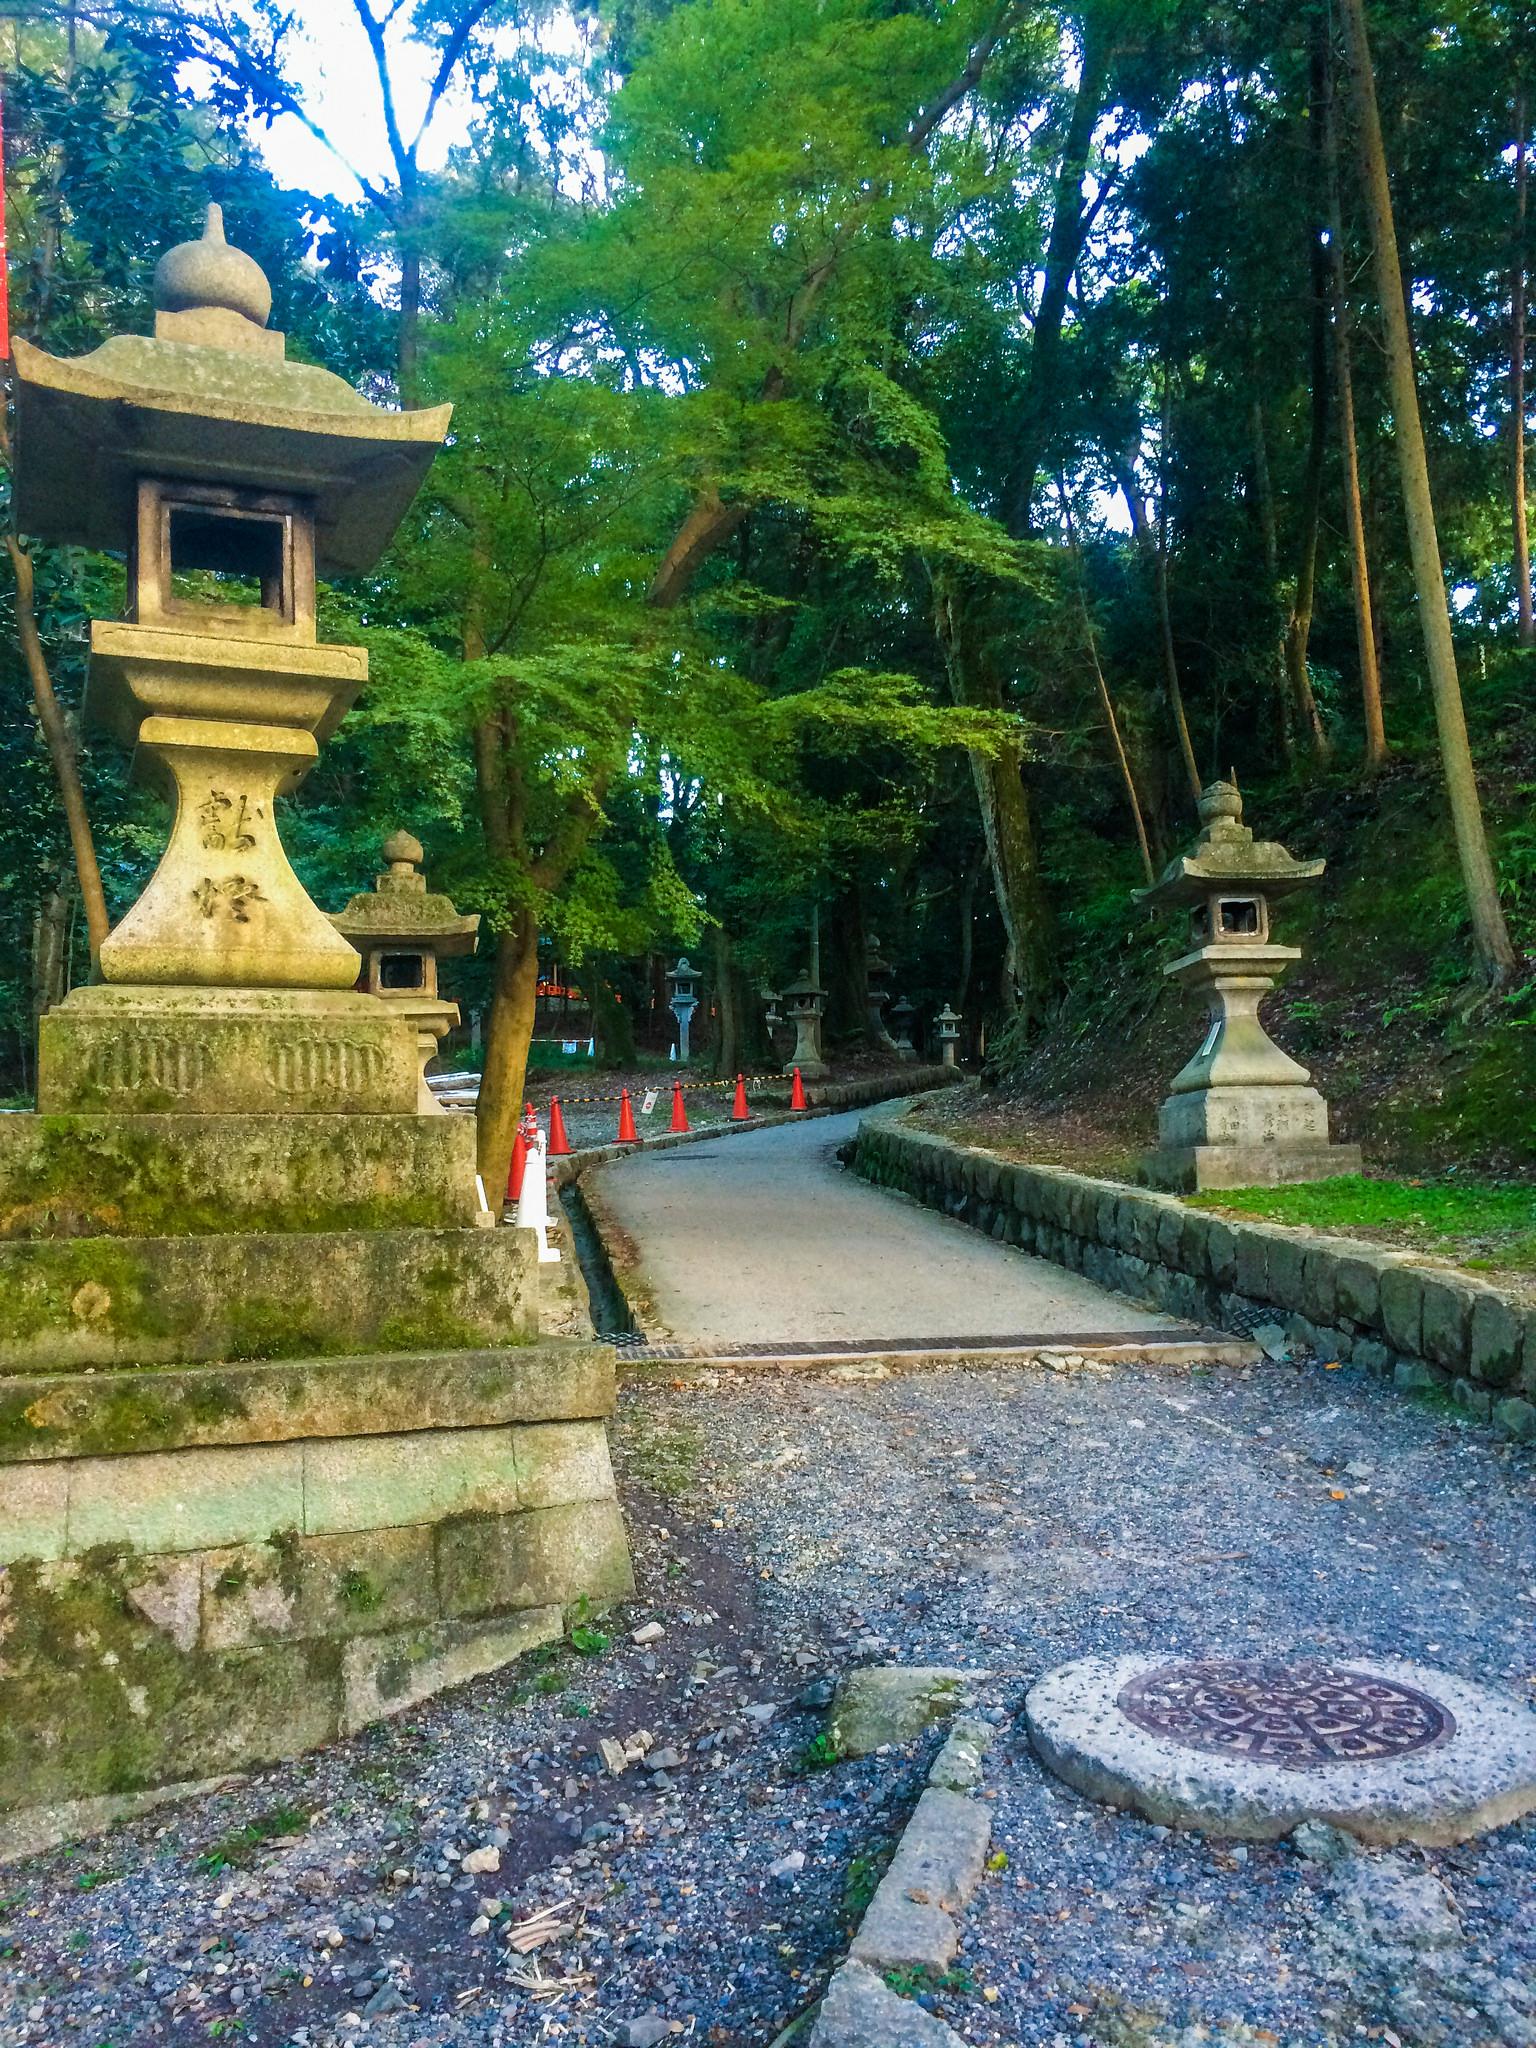 30284608321_6c0596b8b8_k.jpgThe Ultimate Walking Tour of Kyoto's Incredible Fushimi Inari Shrine's 10,000 torii gates